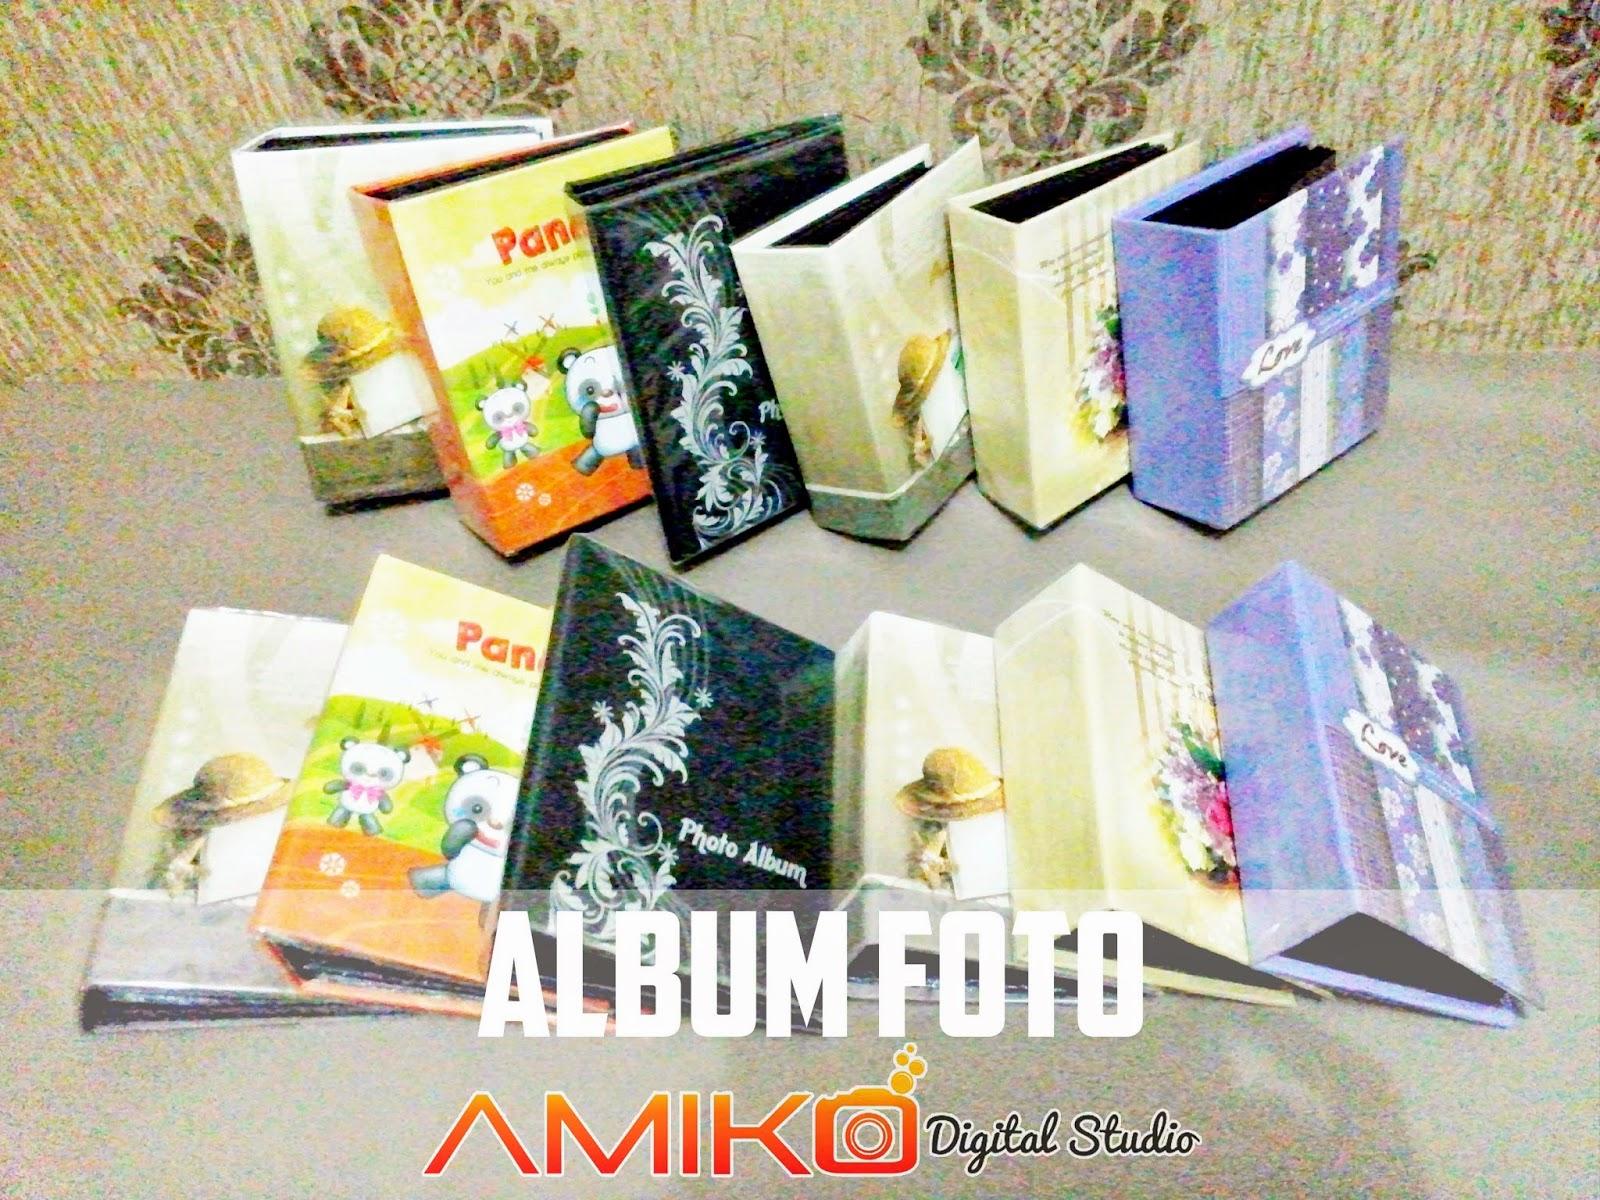 AMIKO DIGITAL STUDIO SURABAYA AMIKO PUSAT PENJUALAN ALBUM